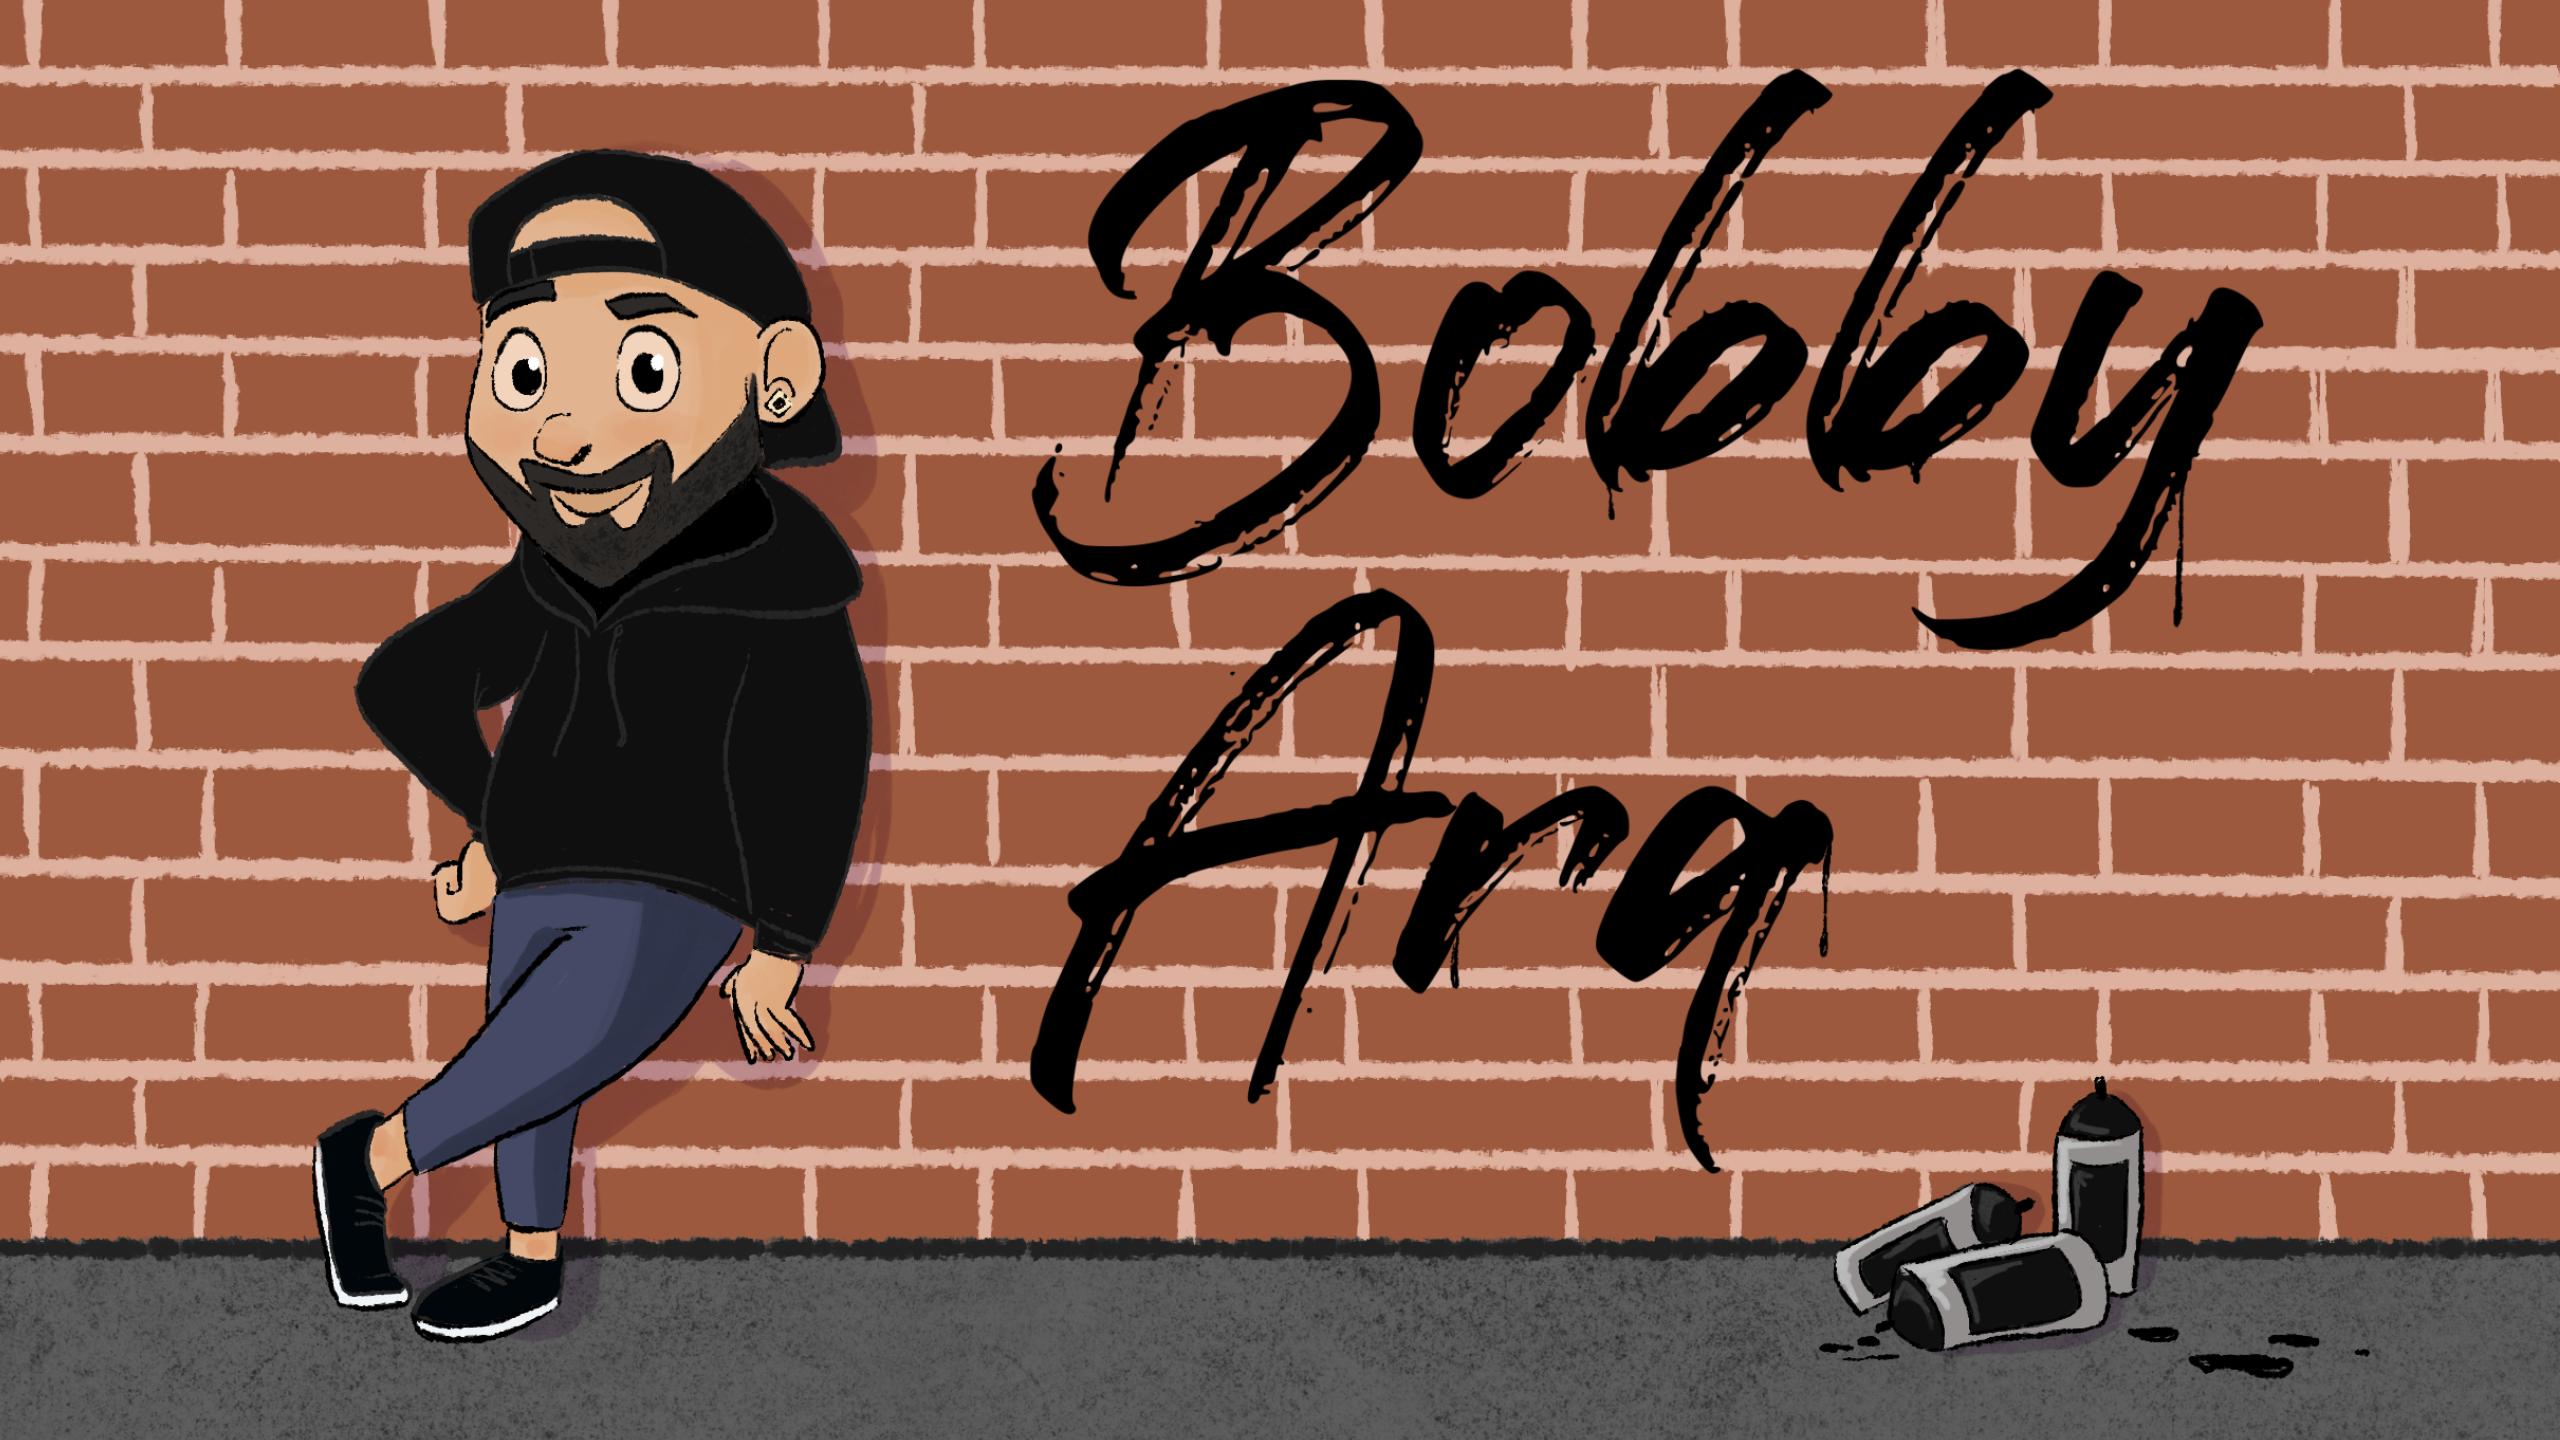 Bobby Arq